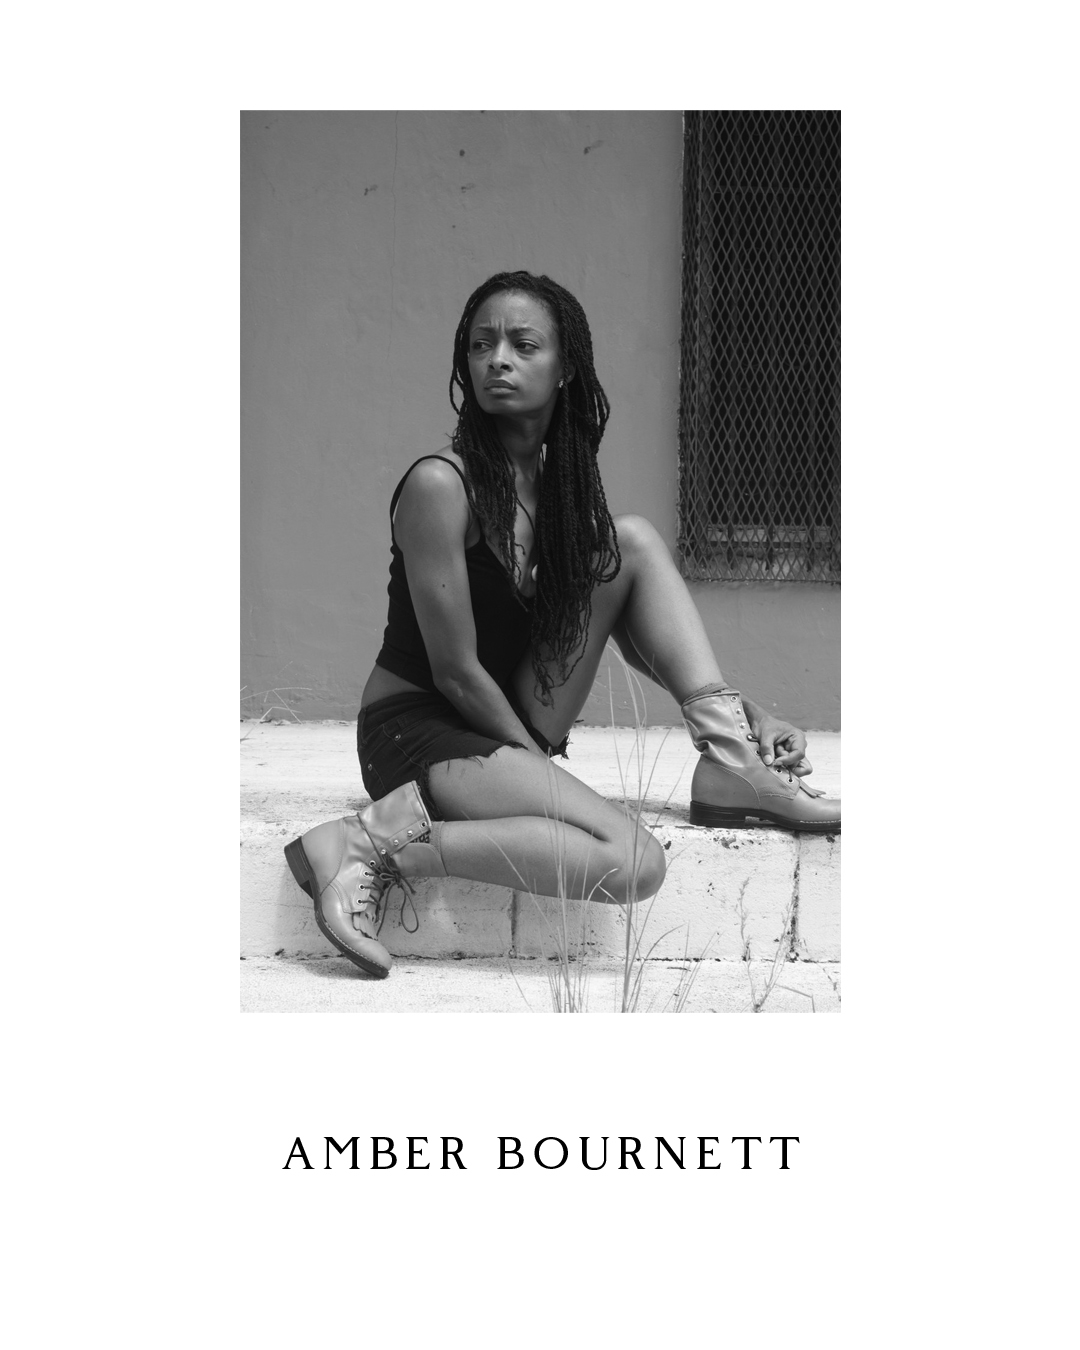 Amber Bournett - Director of Photography